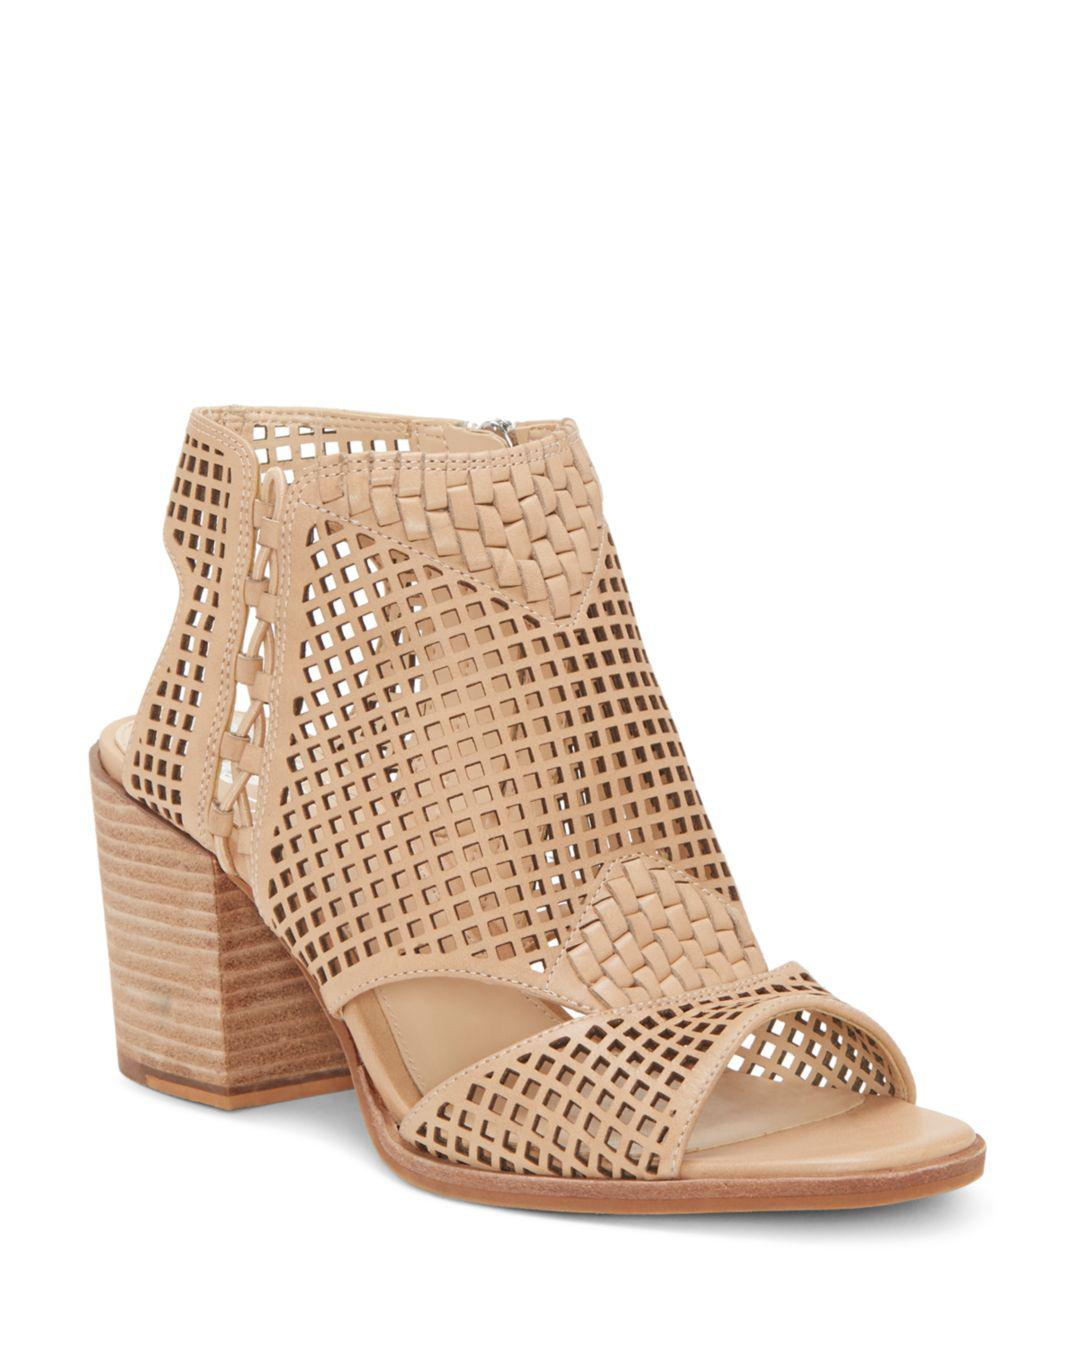 95160655b2e Lyst - Vince Camuto Women s Kampbell Mesh Block Heel Sandals in ...